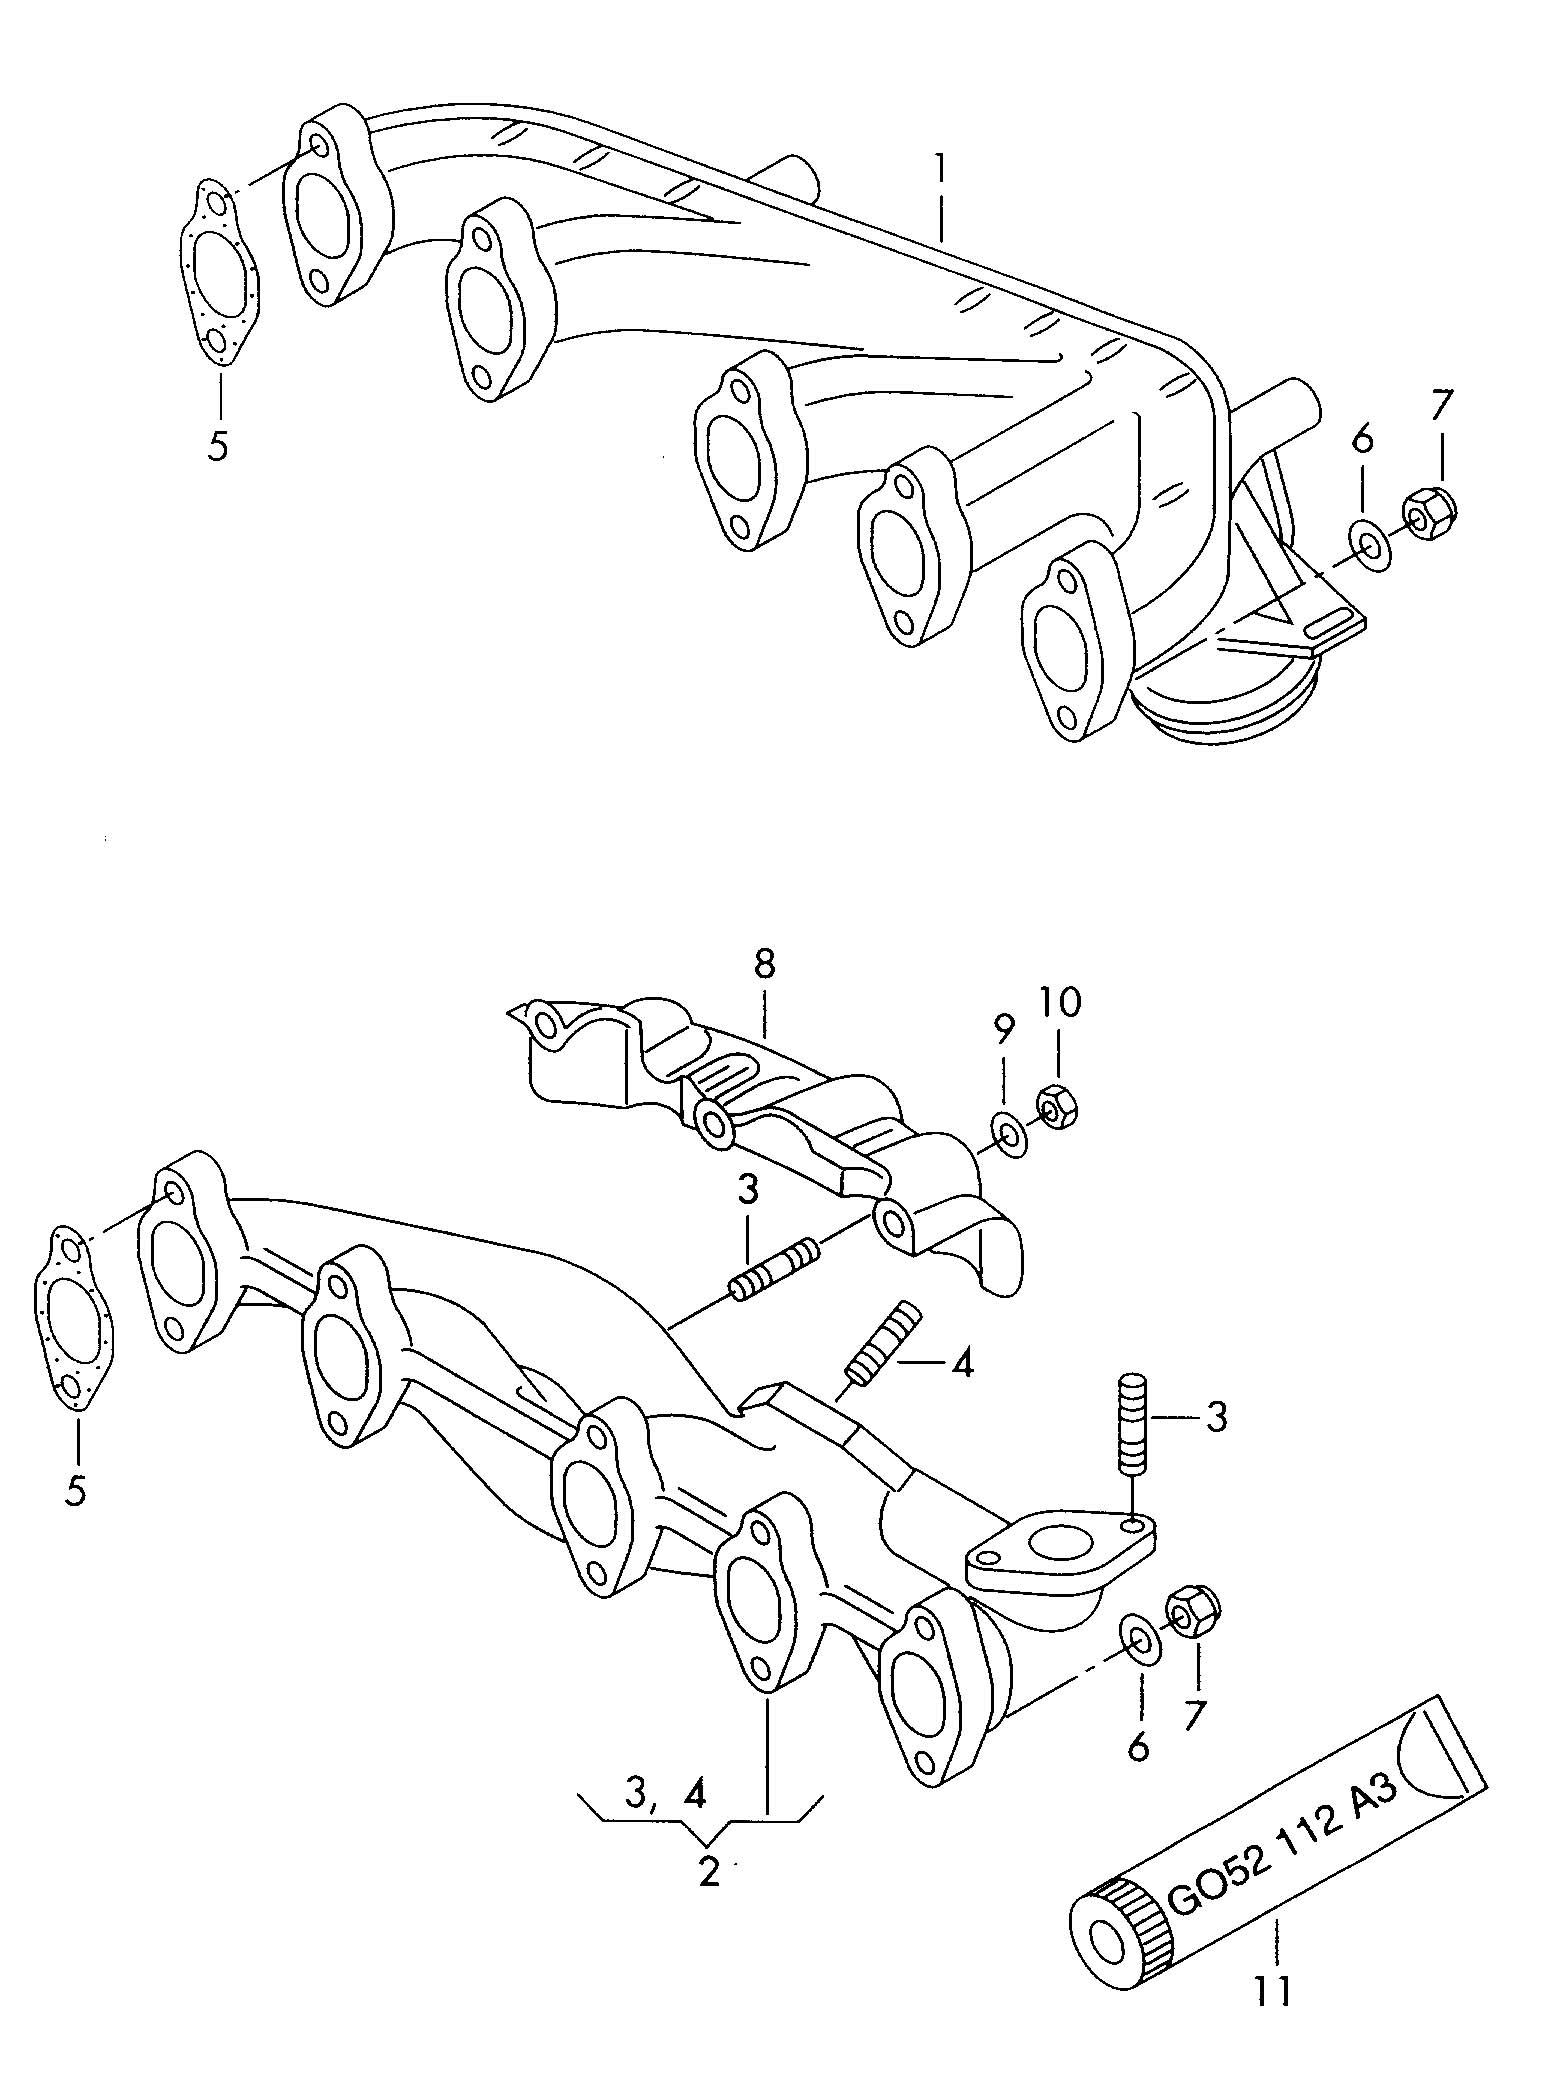 Nissan Maxima Fuse Box Diagram Wiring Schemes. Nissan